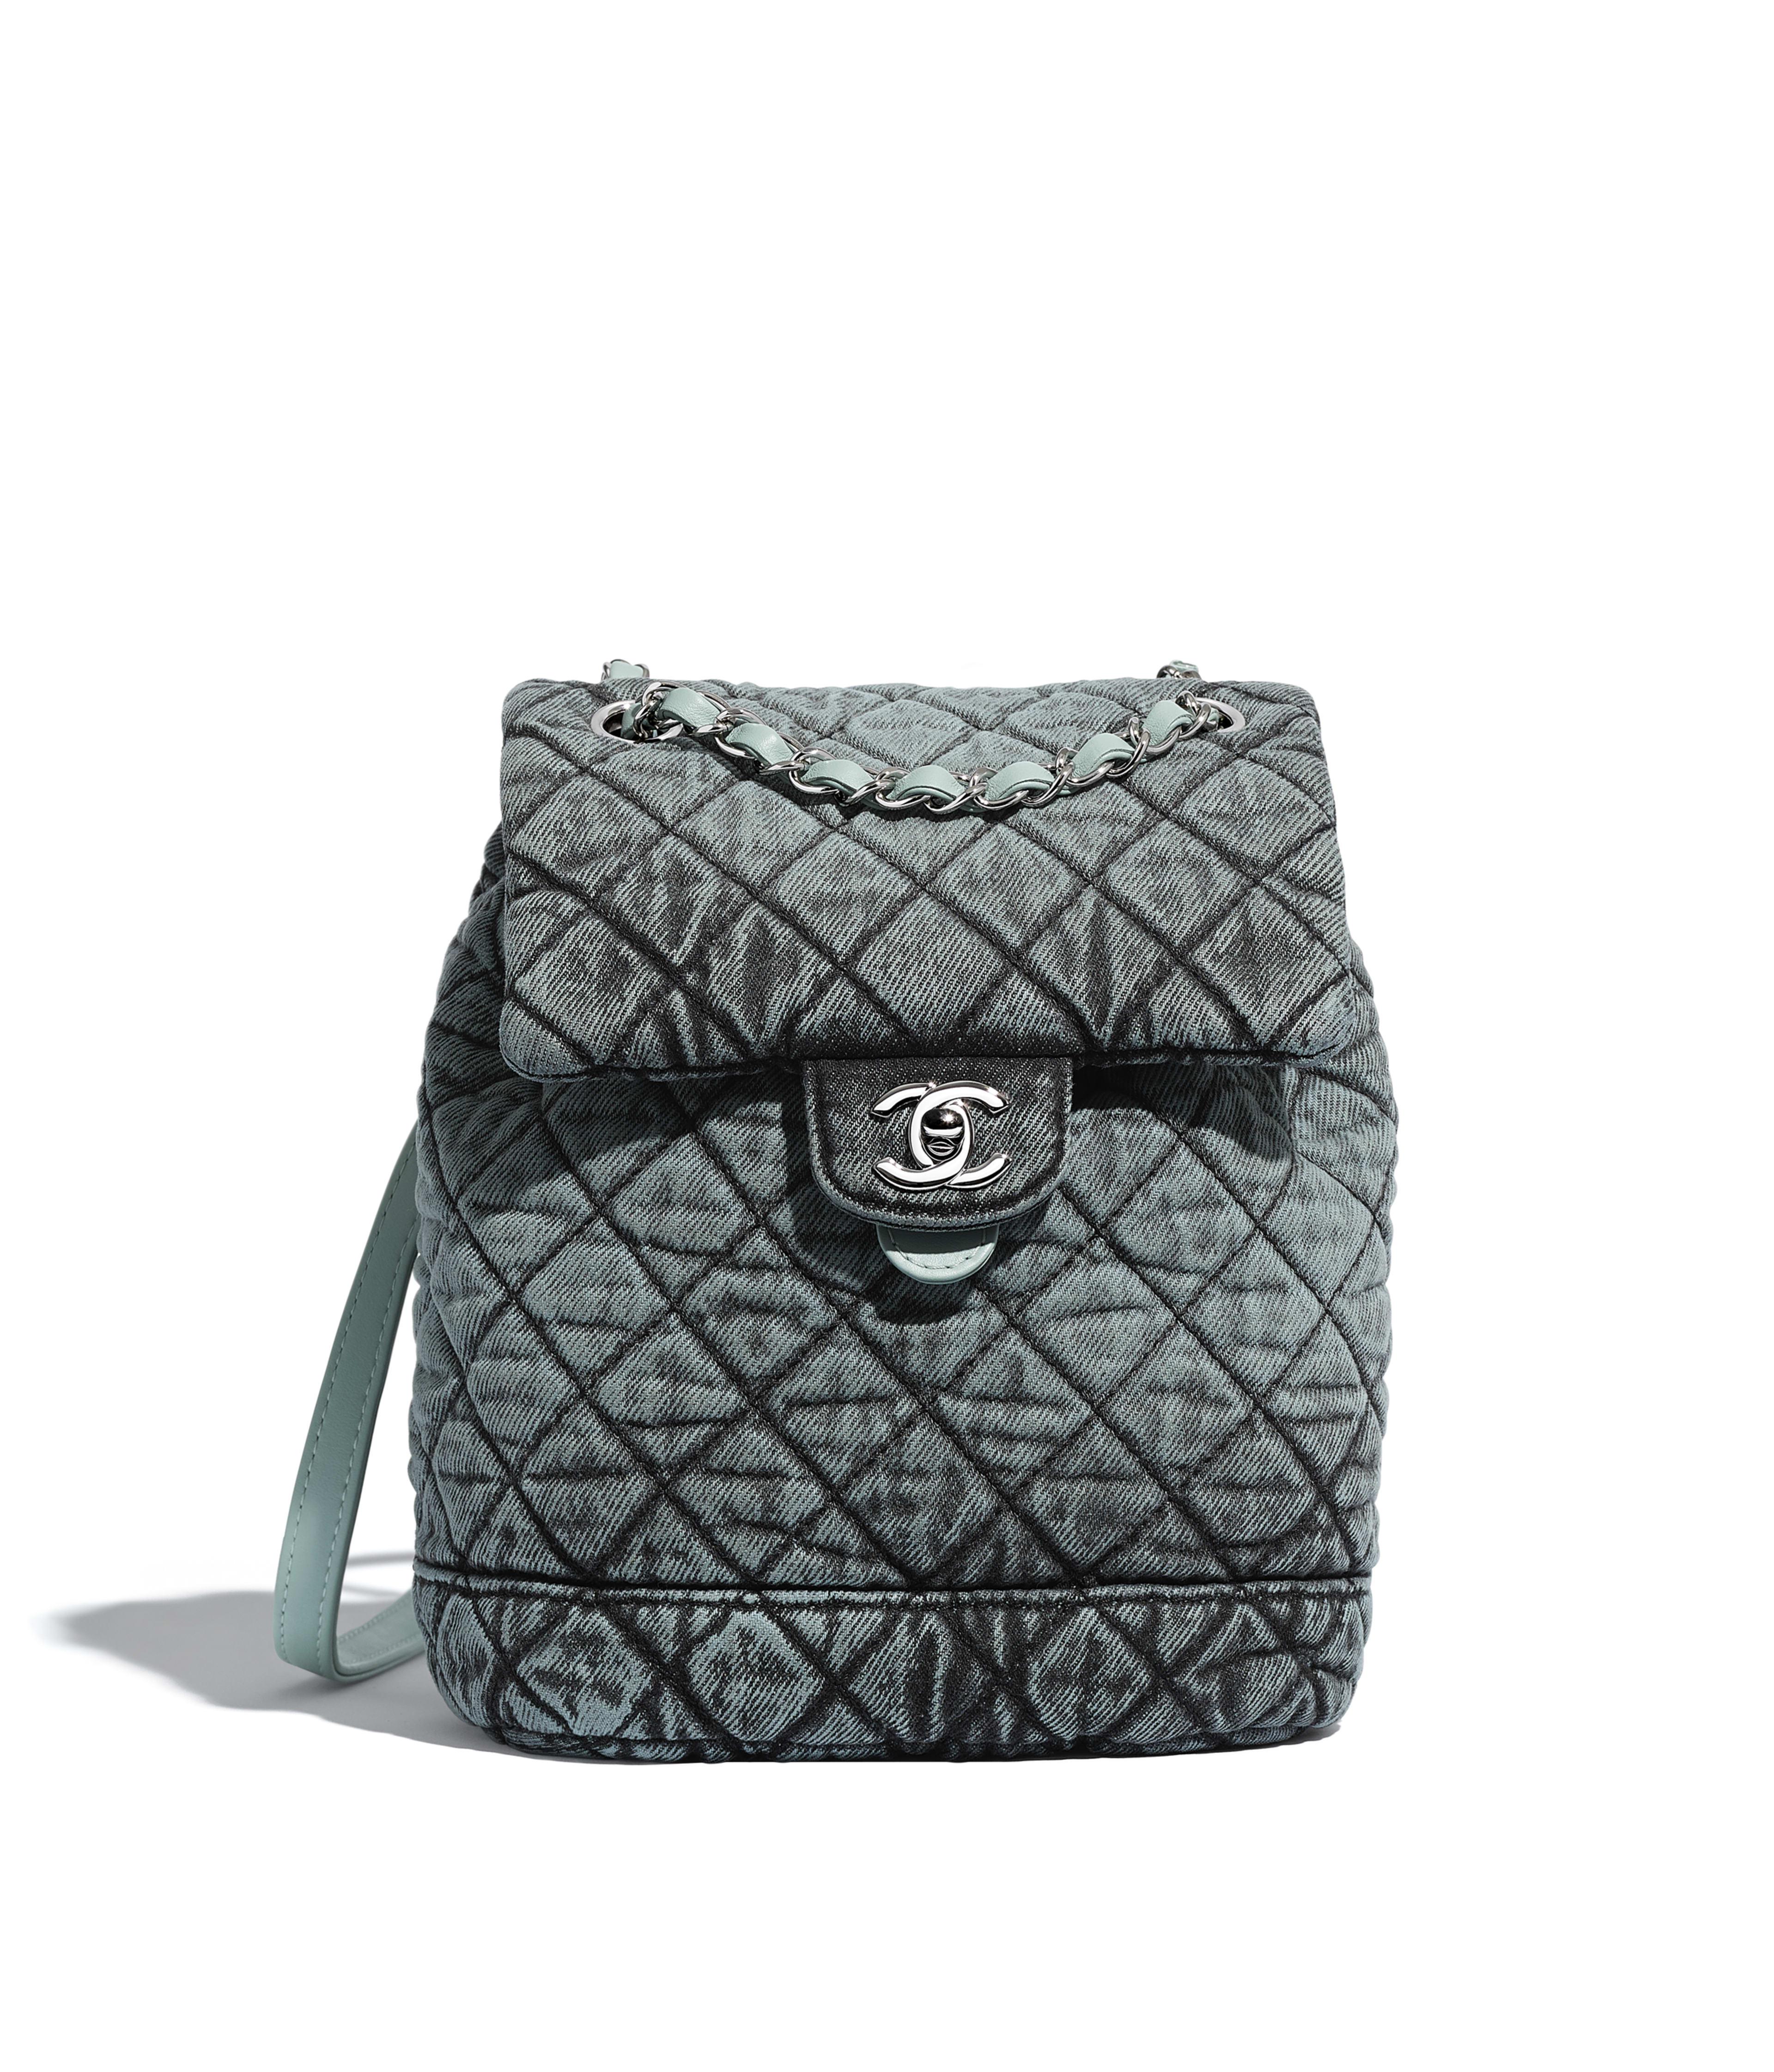 Backpacks Handbags Chanel